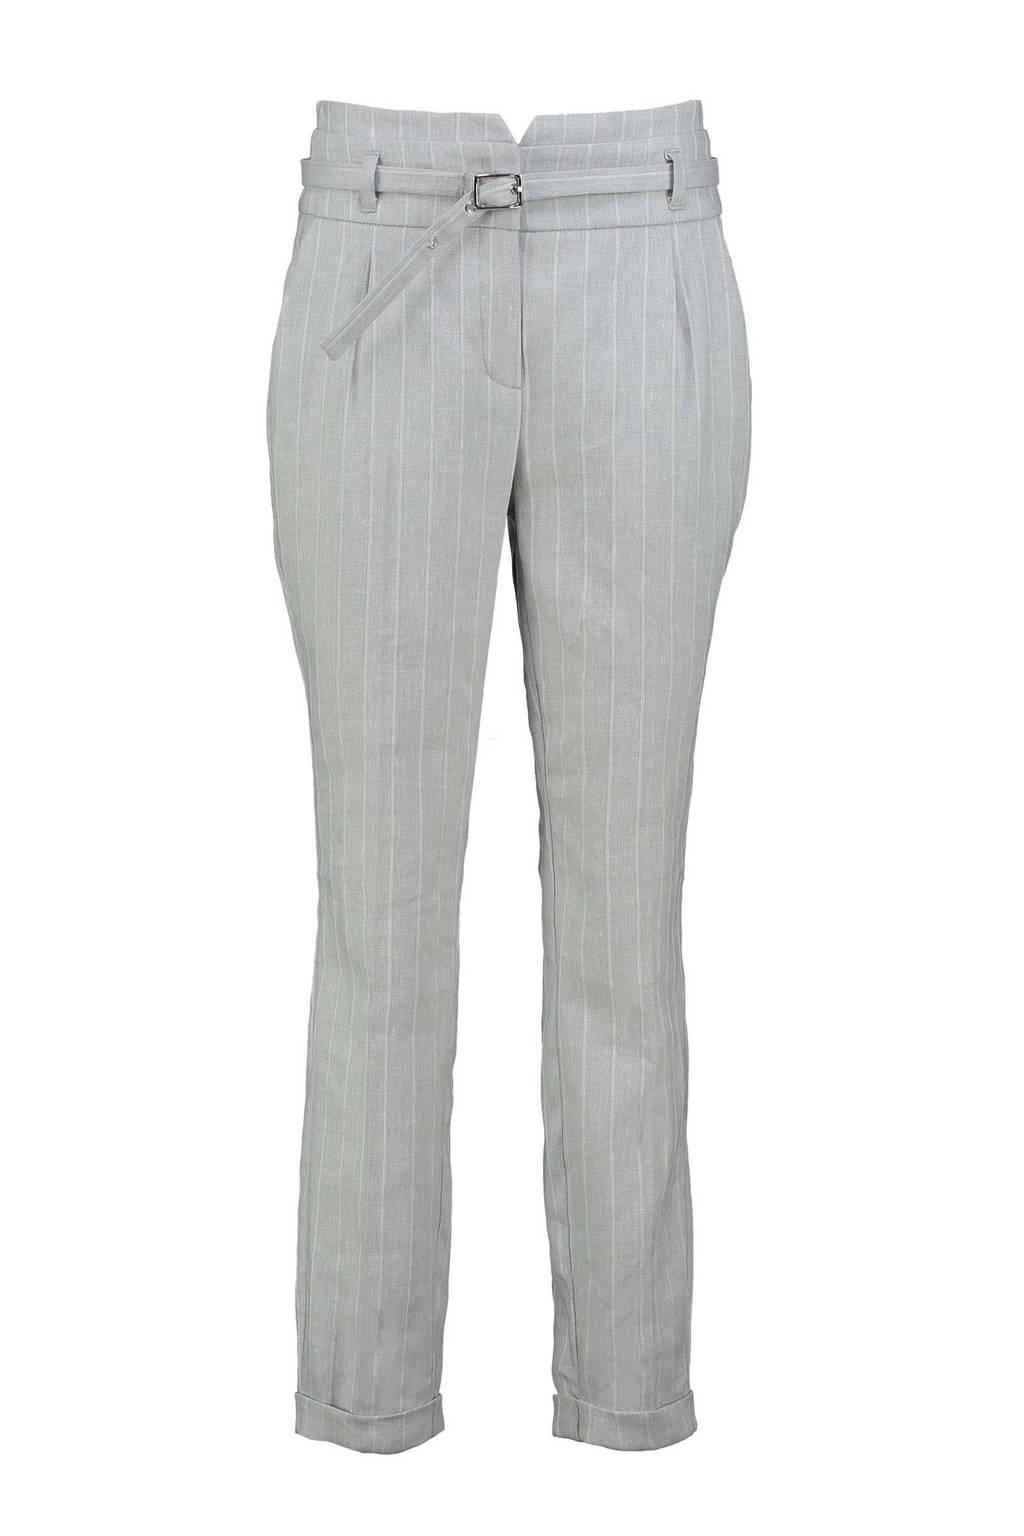 Expresso slim fit pantalon DIEUWERTJ met krijtstreep grijs, Grijs